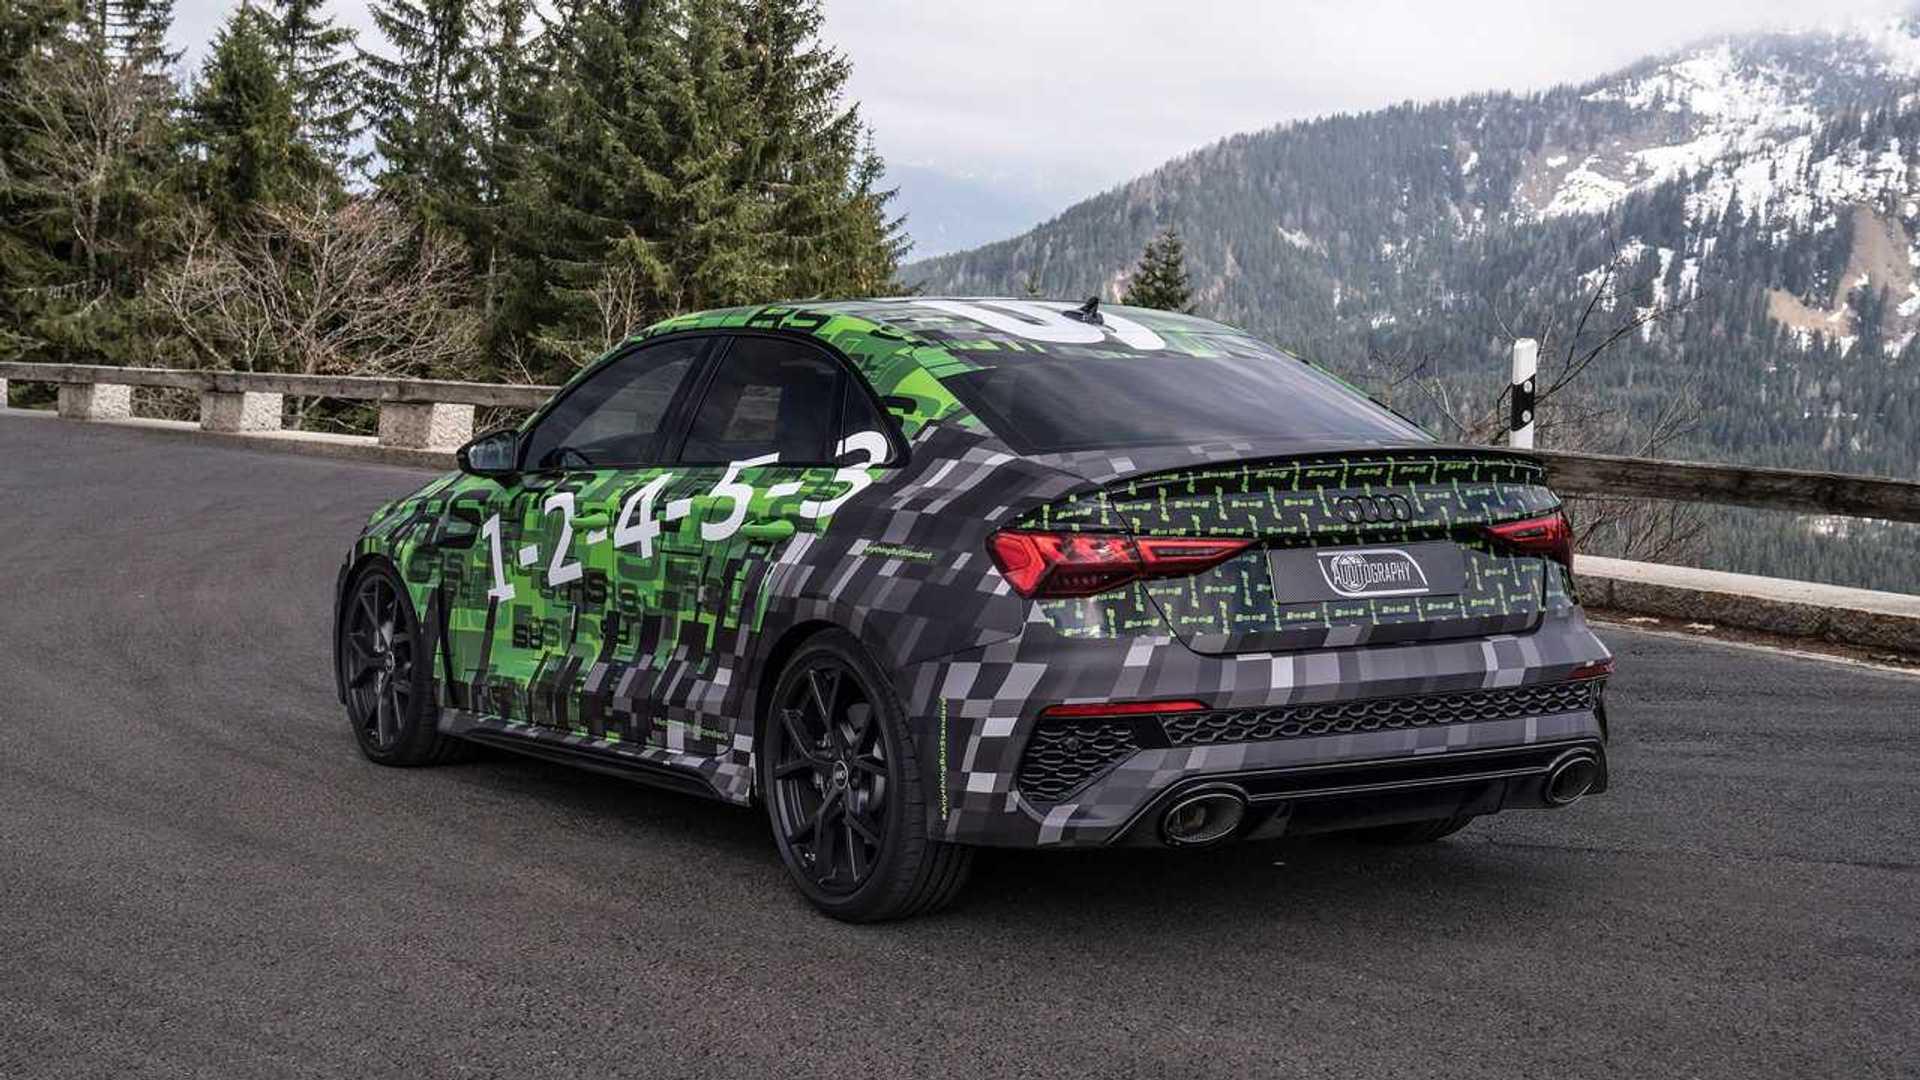 2022-audi-rs3-sedan-shot-by-auditography.jpg